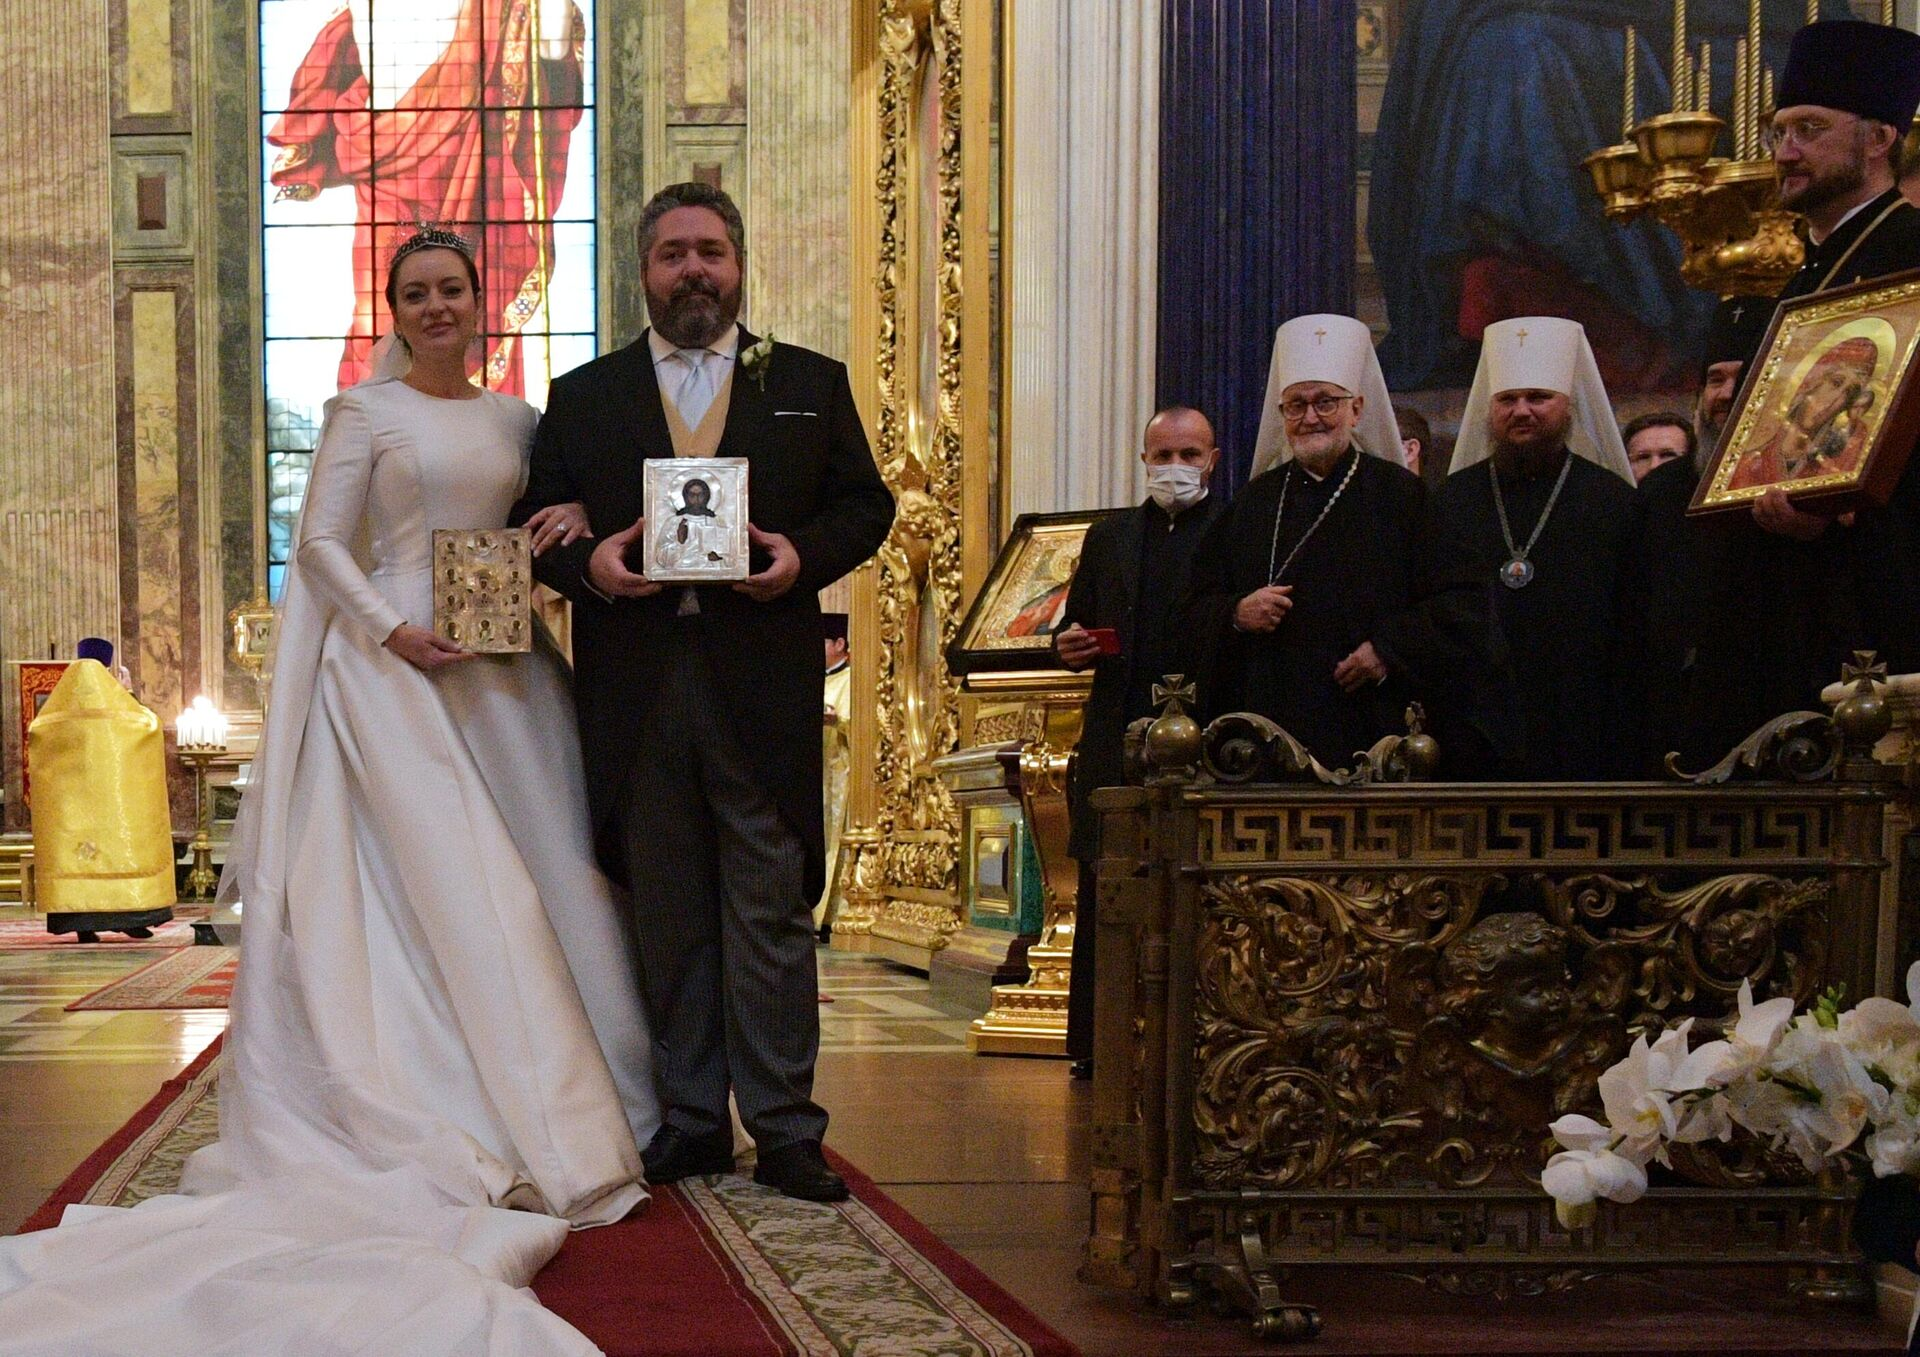 O Δούκας Γεώργιος Μιχαήλοβιτς Ρομανόφ και η Βικτόρια Ρομανόβνα Μπεταρίνι κρατούν εικόνες κατά τη διάρκεια της γαμήλιας τελετής  - Sputnik Ελλάδα, 1920, 01.10.2021